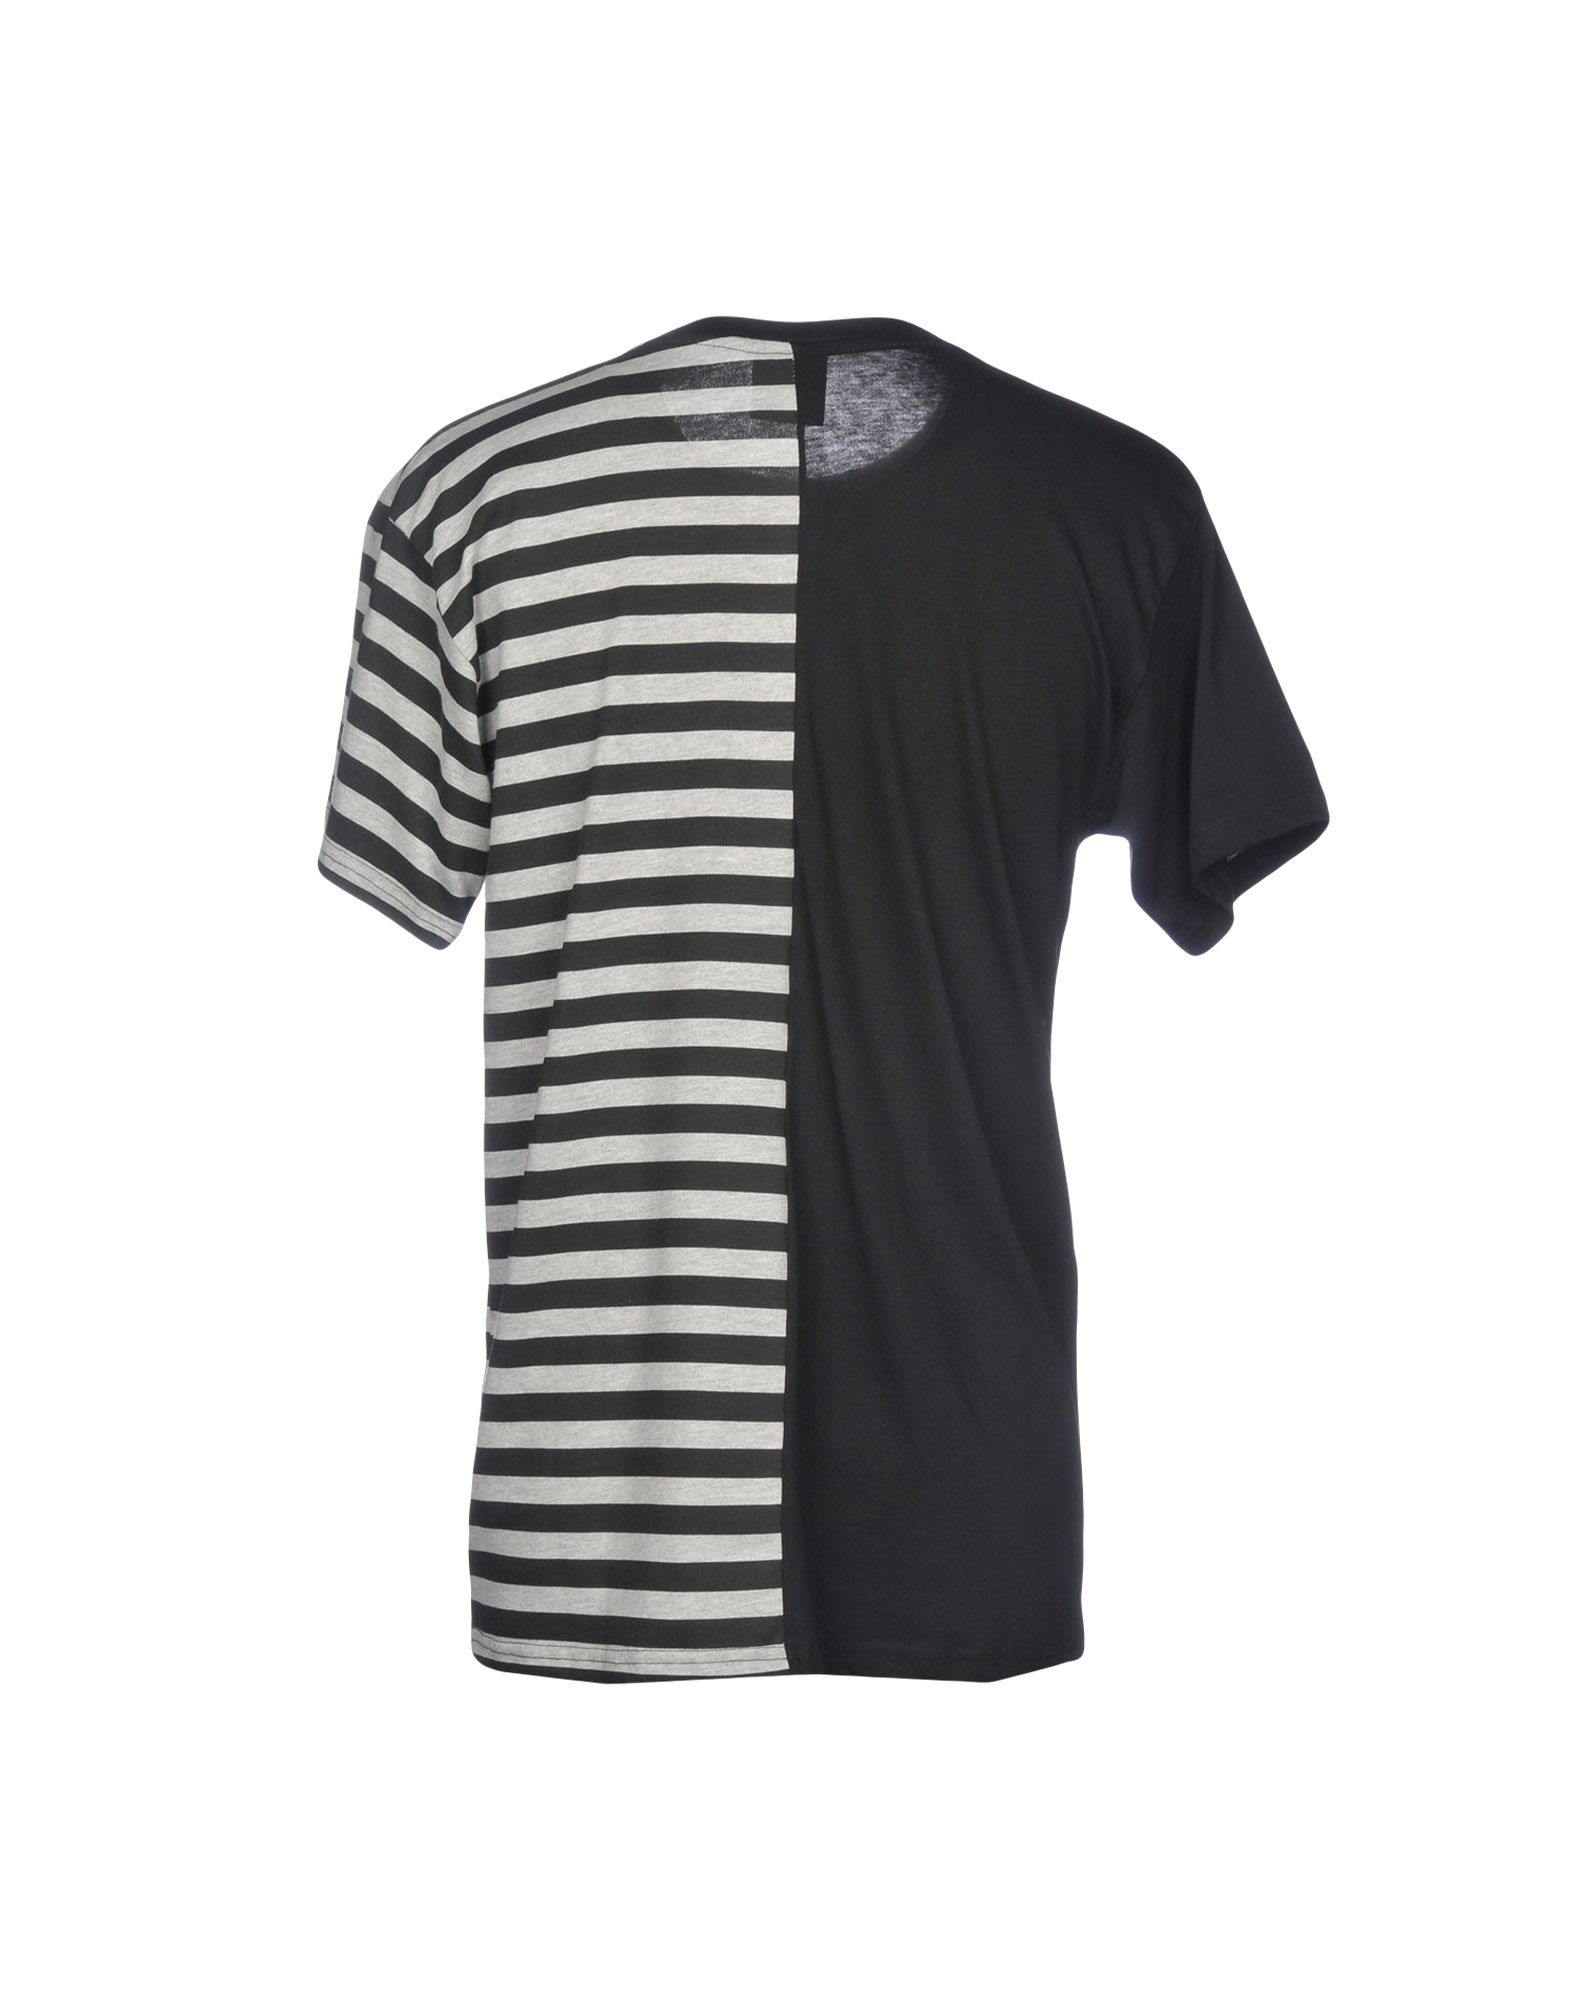 T-Shirt Les (Art)Ists (Art)Ists Les Uomo - 12205323FW 7ed64e